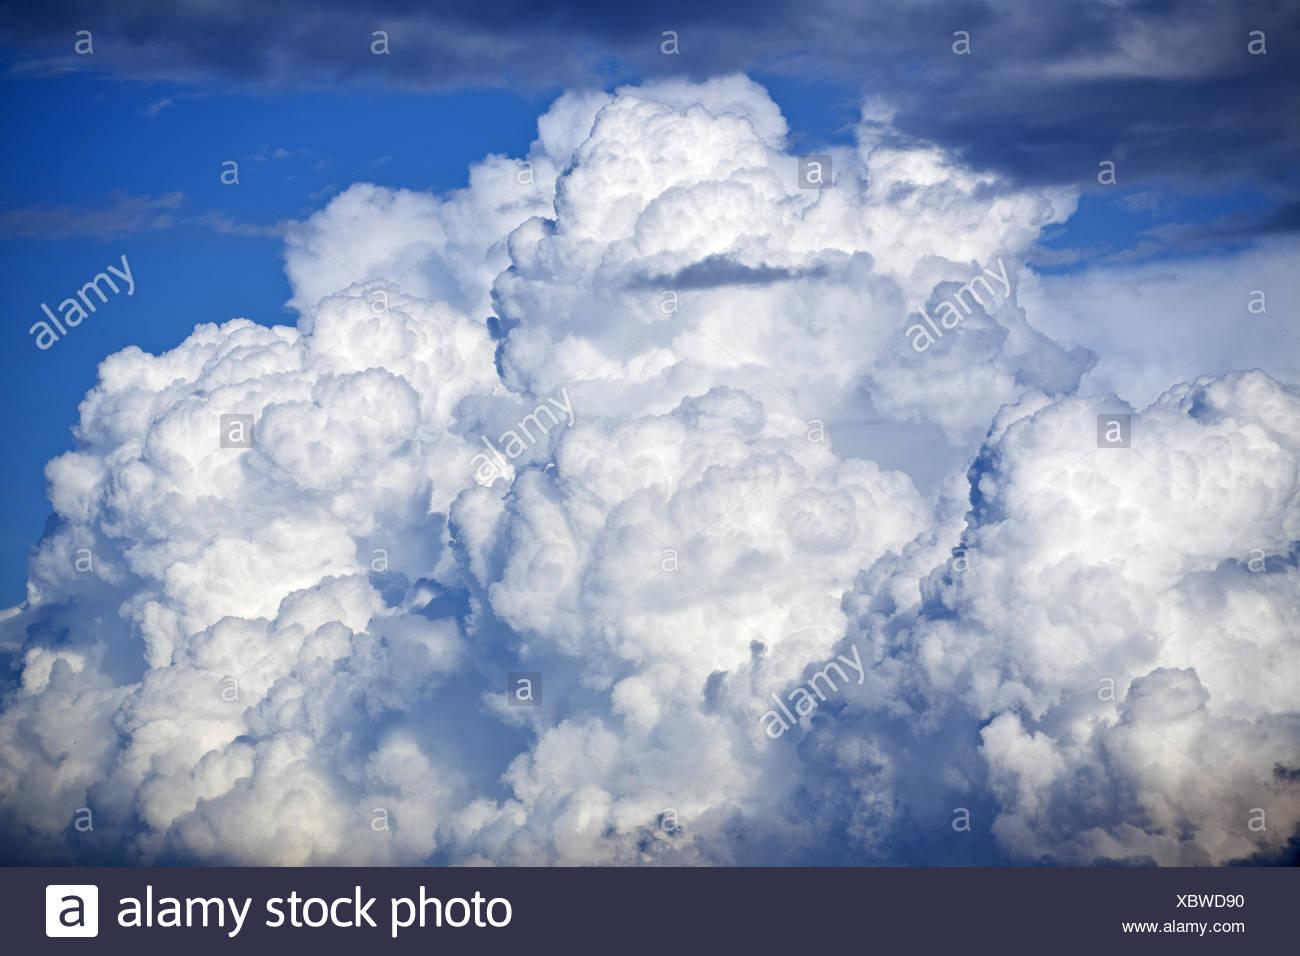 big thunder cloud and blue sky - Stock Image